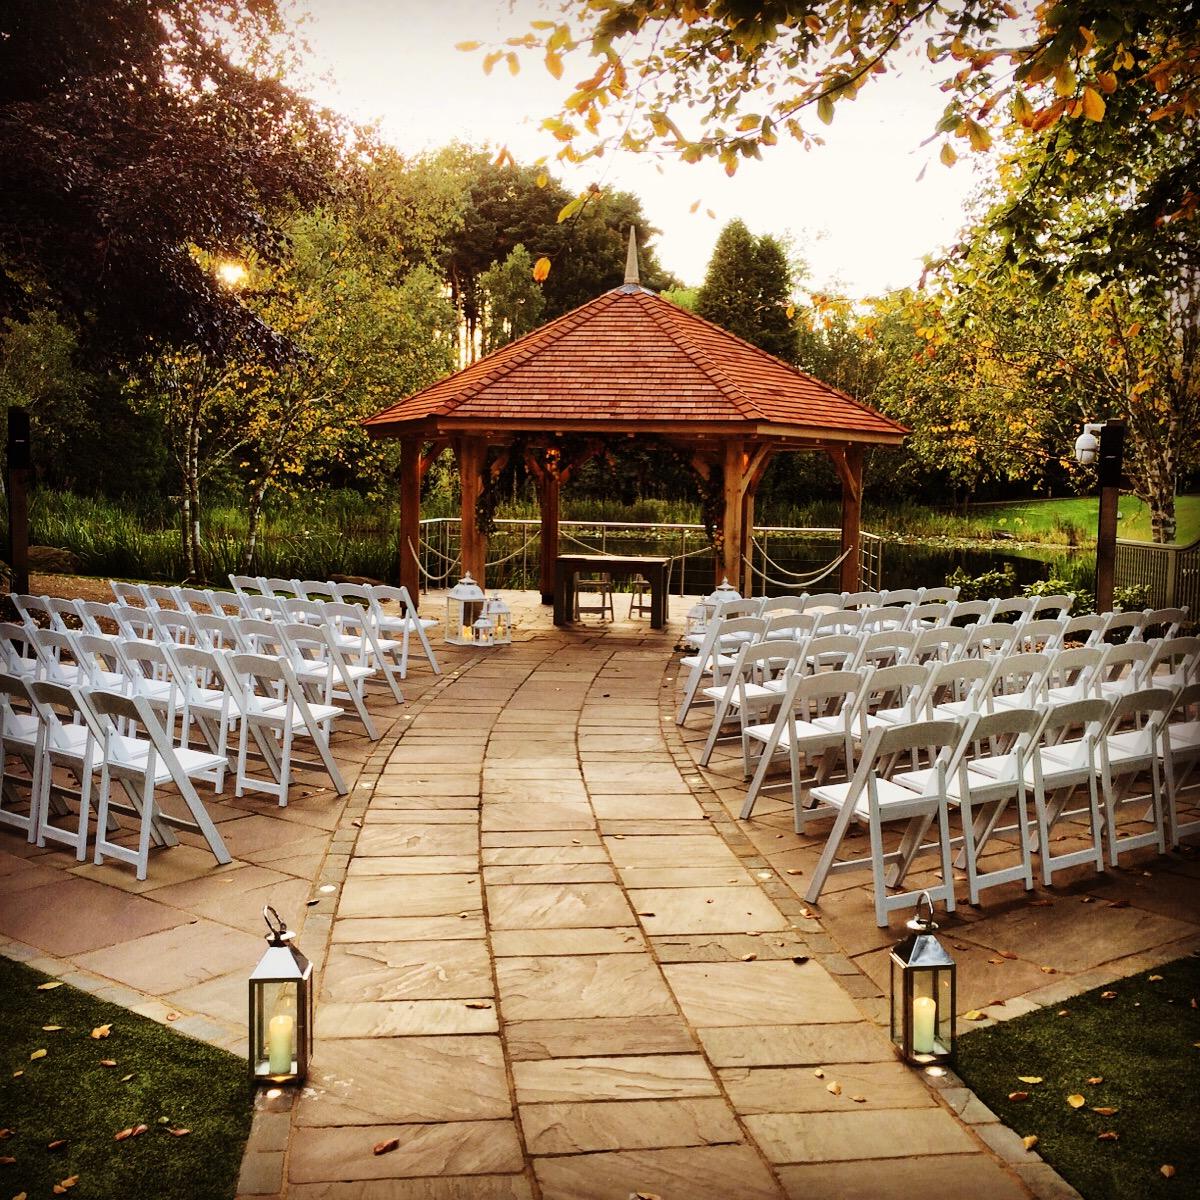 Moddershall outdoor wedding venue